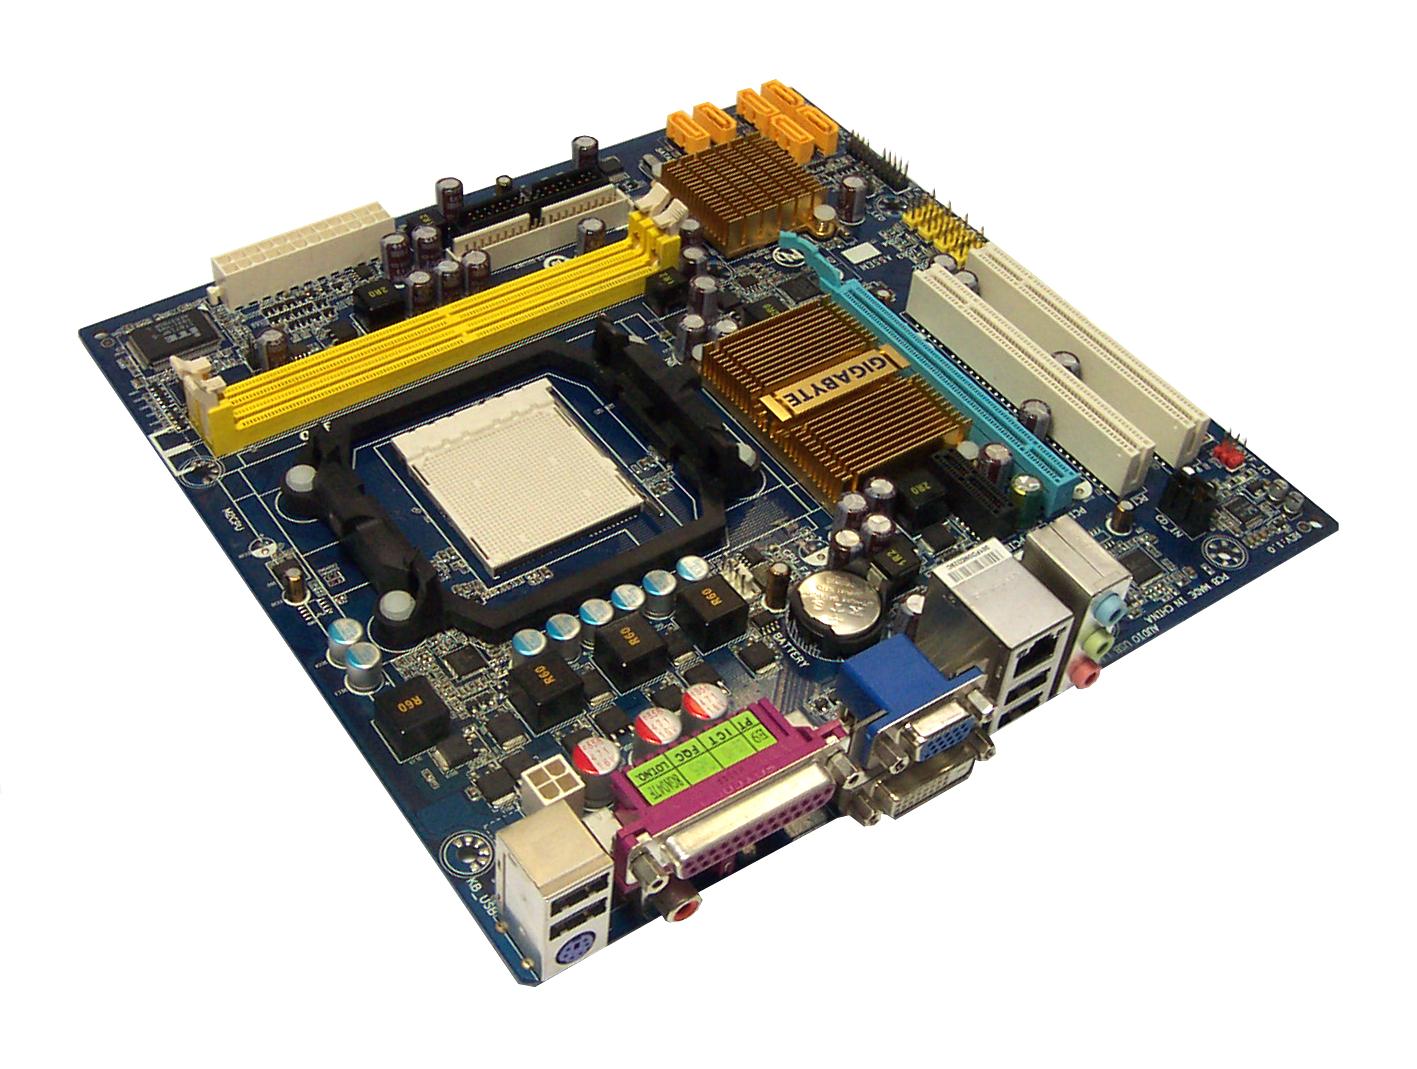 Gigabyte GA-MA74GM-S2H REV 1.0 Socket AM2+ Motherboard